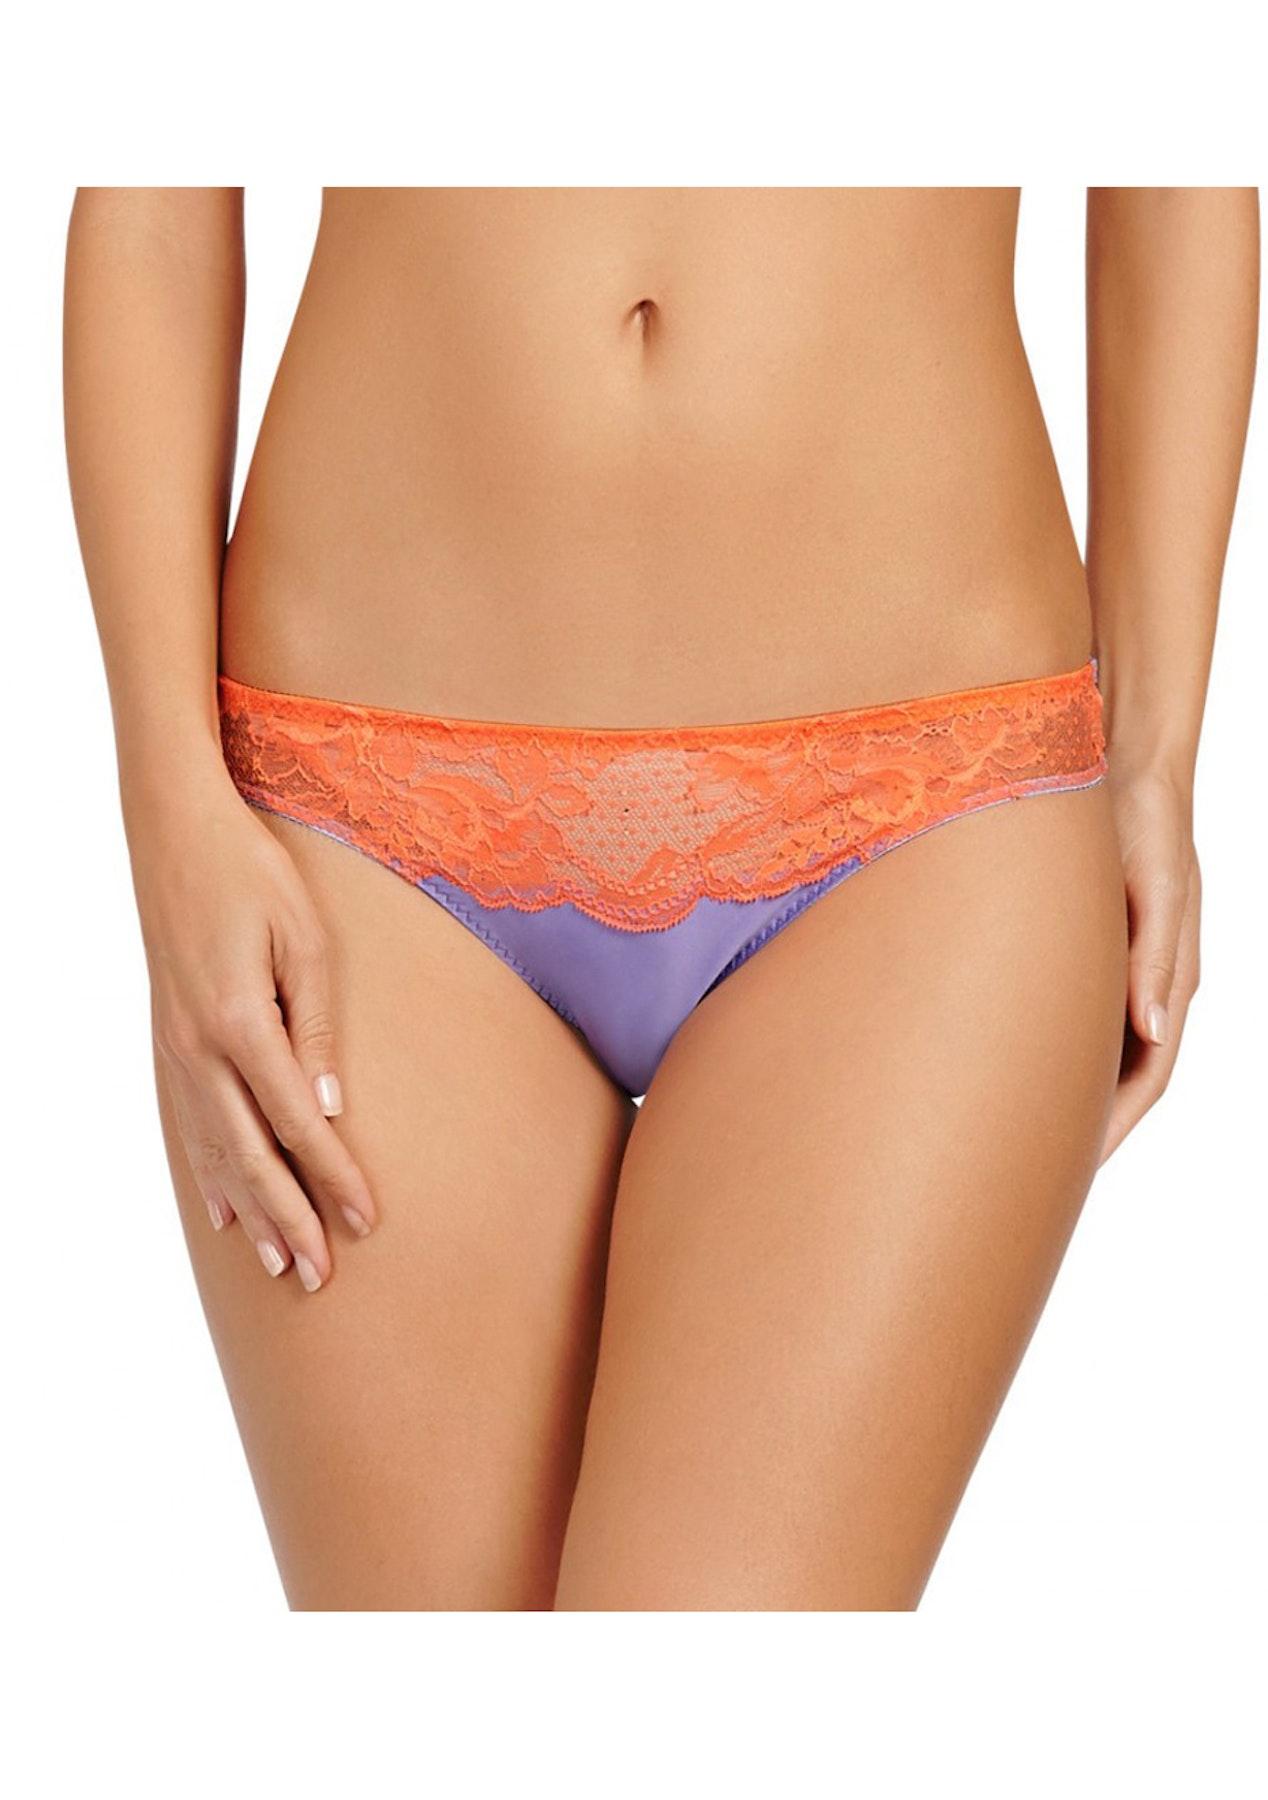 750d0f1be5597 Stella McCartney - Julia Stargazing Bikini Brief - Lavender Fluo Orange -  Lingerie Shop - Onceit